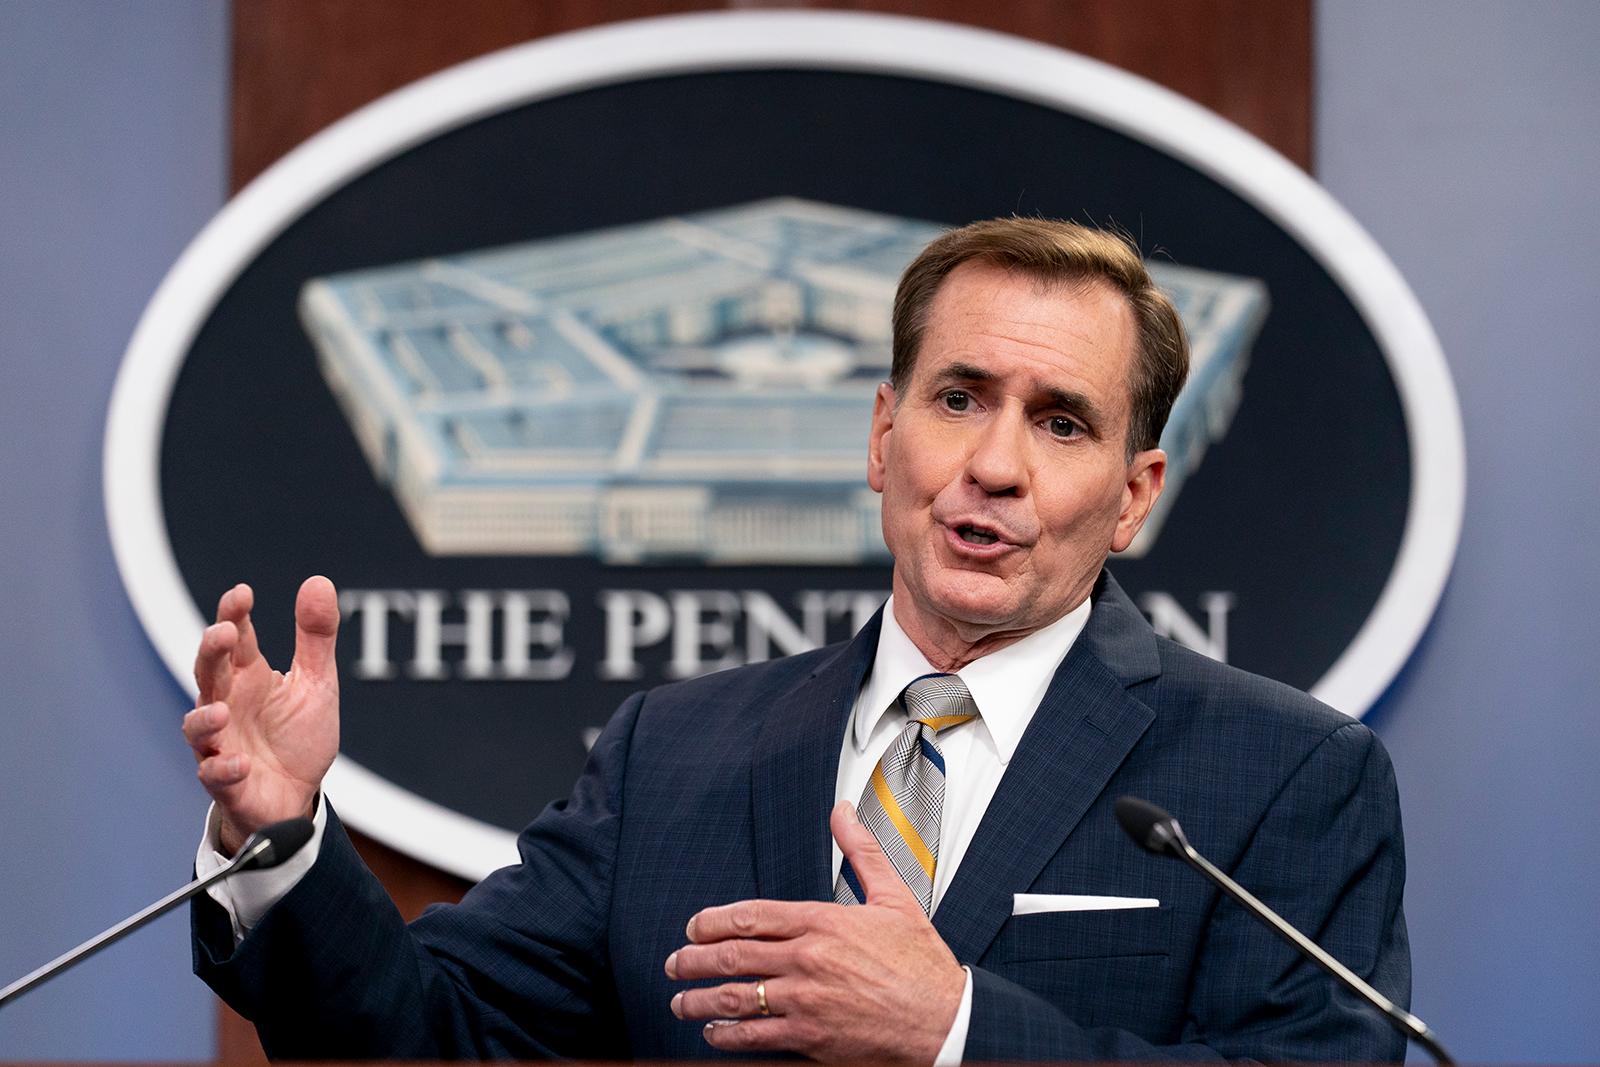 Pentagon spokesman John Kirby speaks during a briefing at the Pentagon in Washington on Thursday.